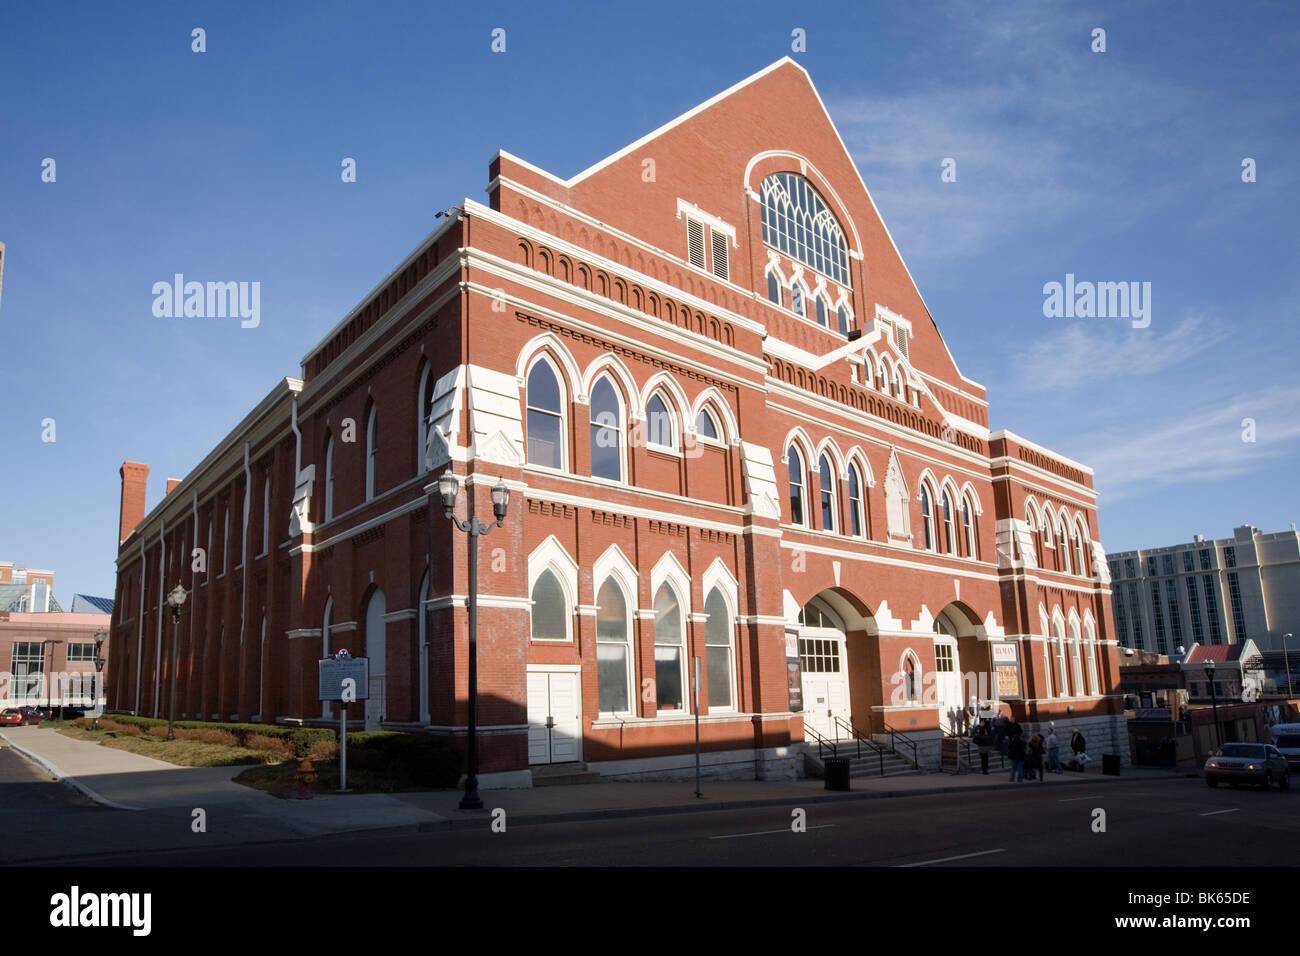 ryman auditorium, original site of grand ole opry, nashville stock